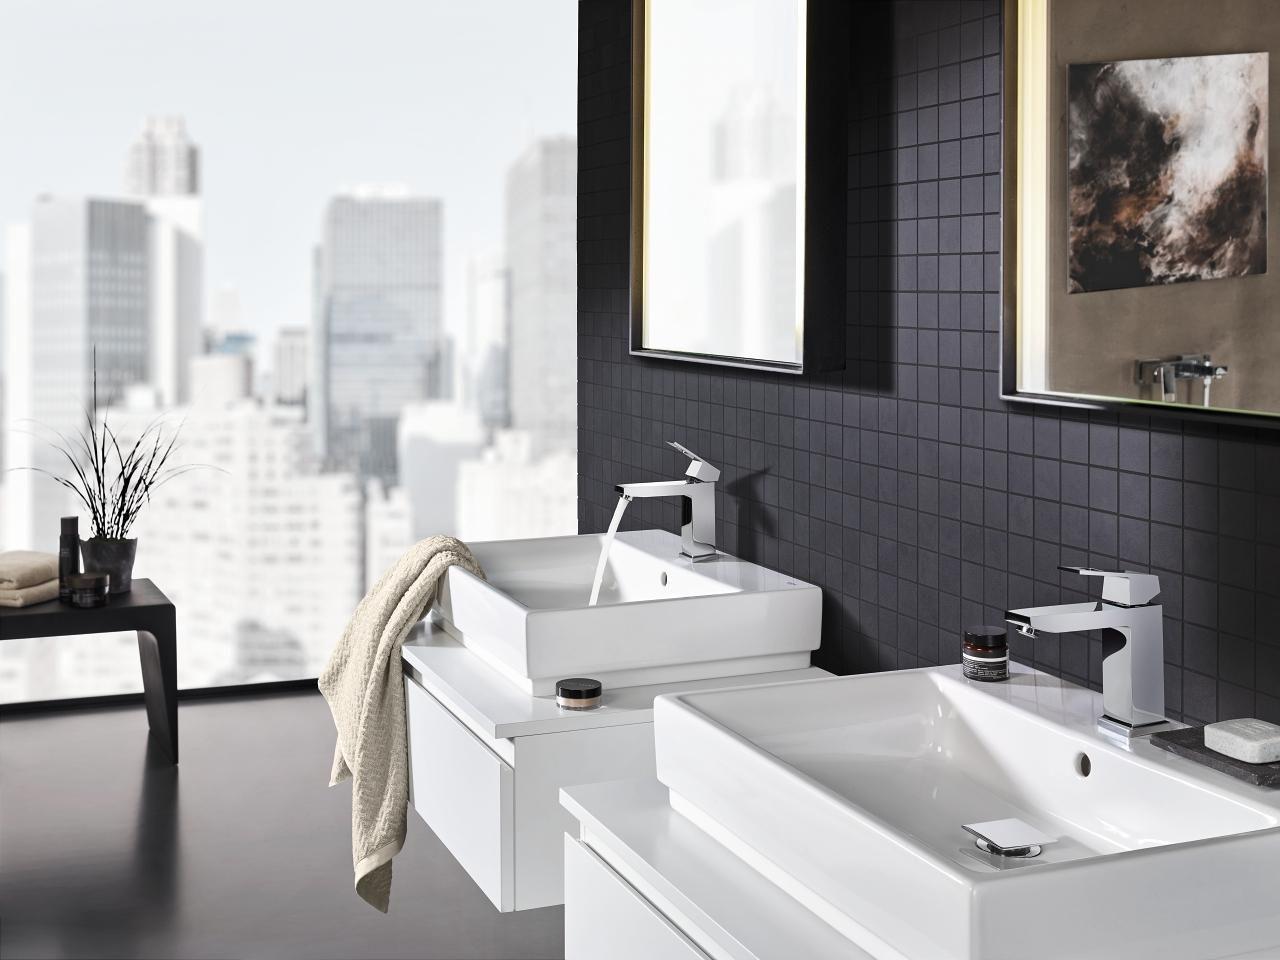 Badkamer met vierkante vormen - Wastafels badkamer ideeën ...